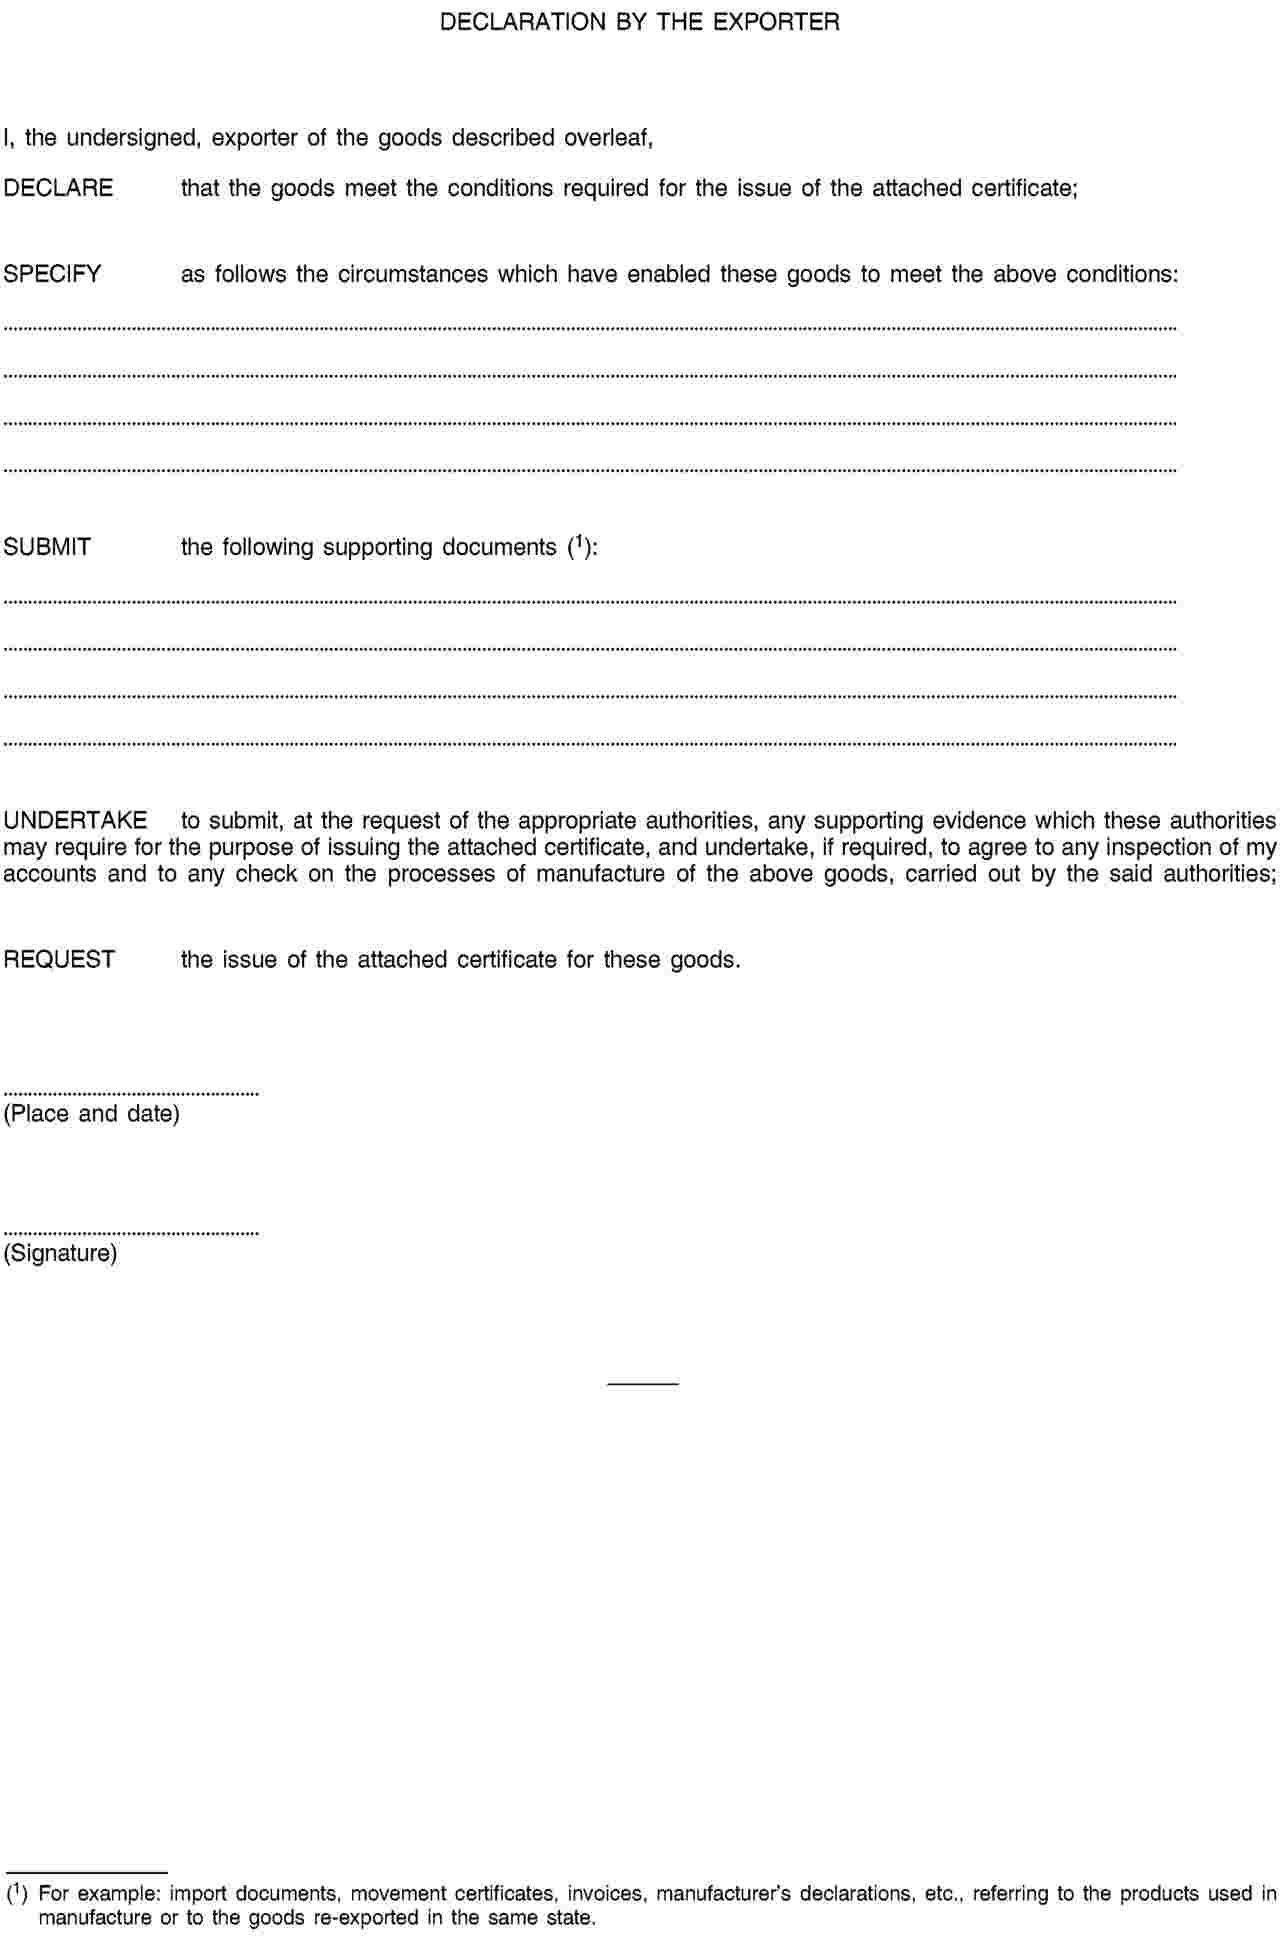 Kingdom Classification Worksheet Answers